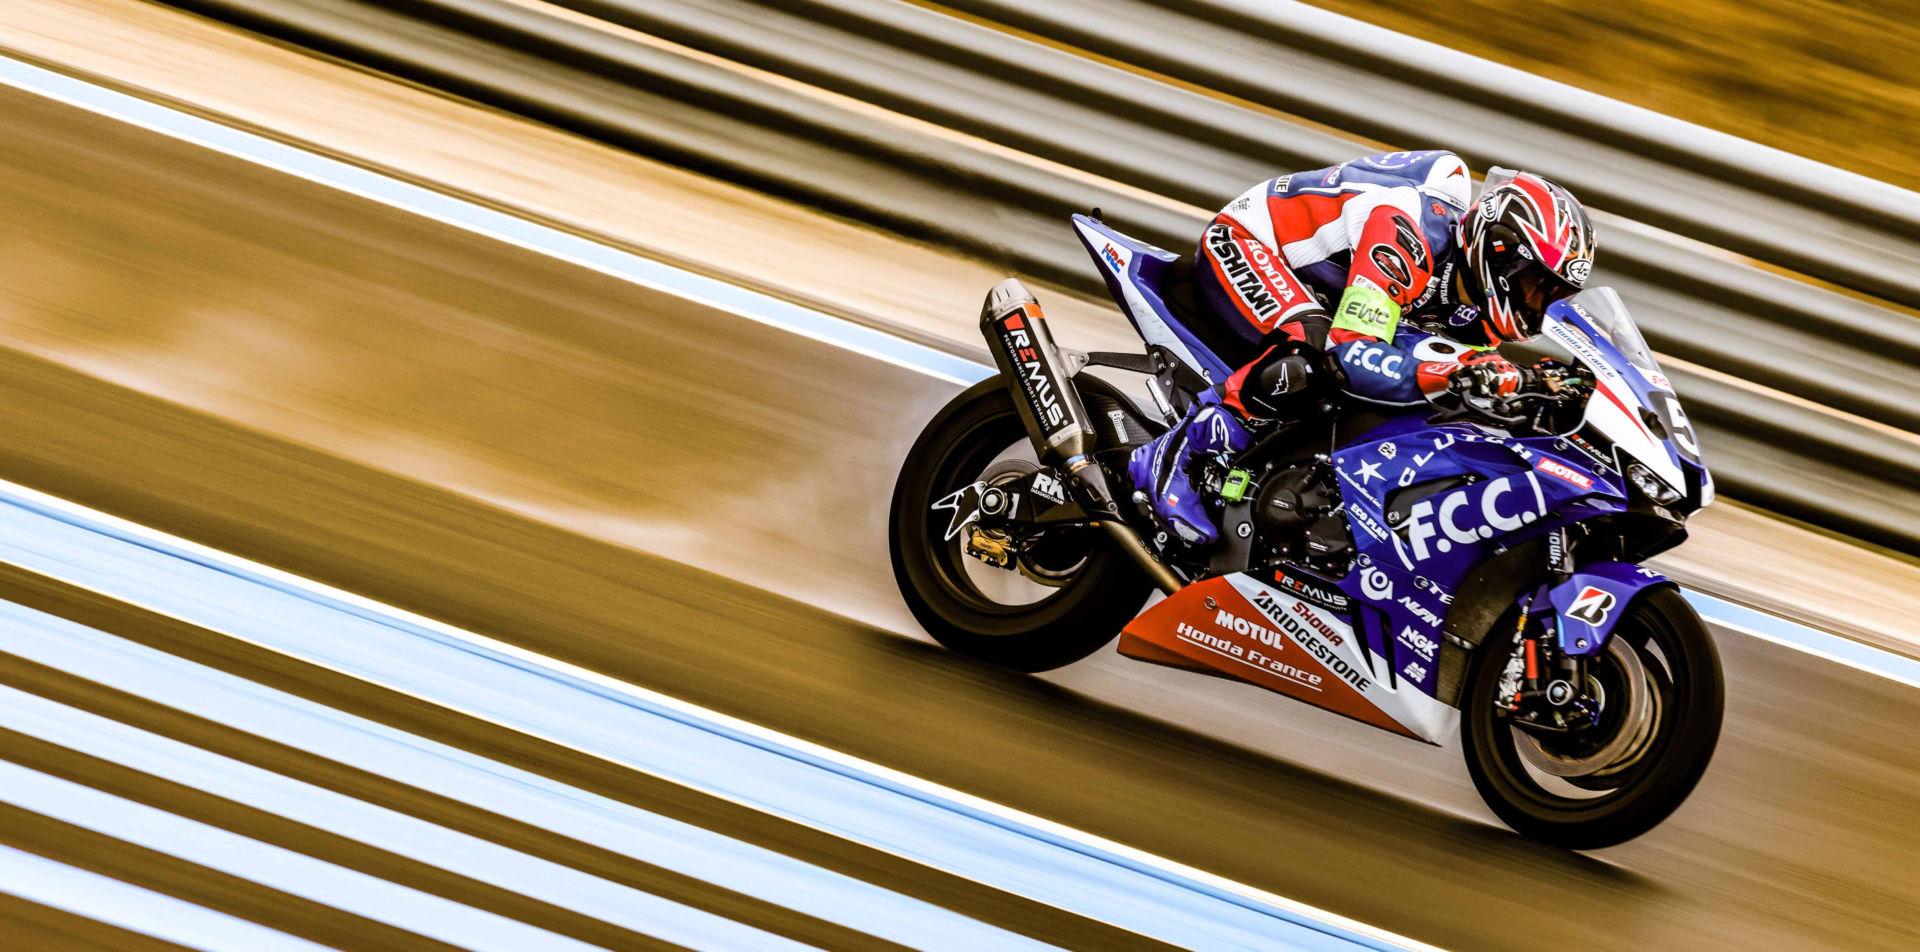 F.C.C. TSR Honda France (5) in action Thursday morning in France. Photo courtesy Eurosport Events.